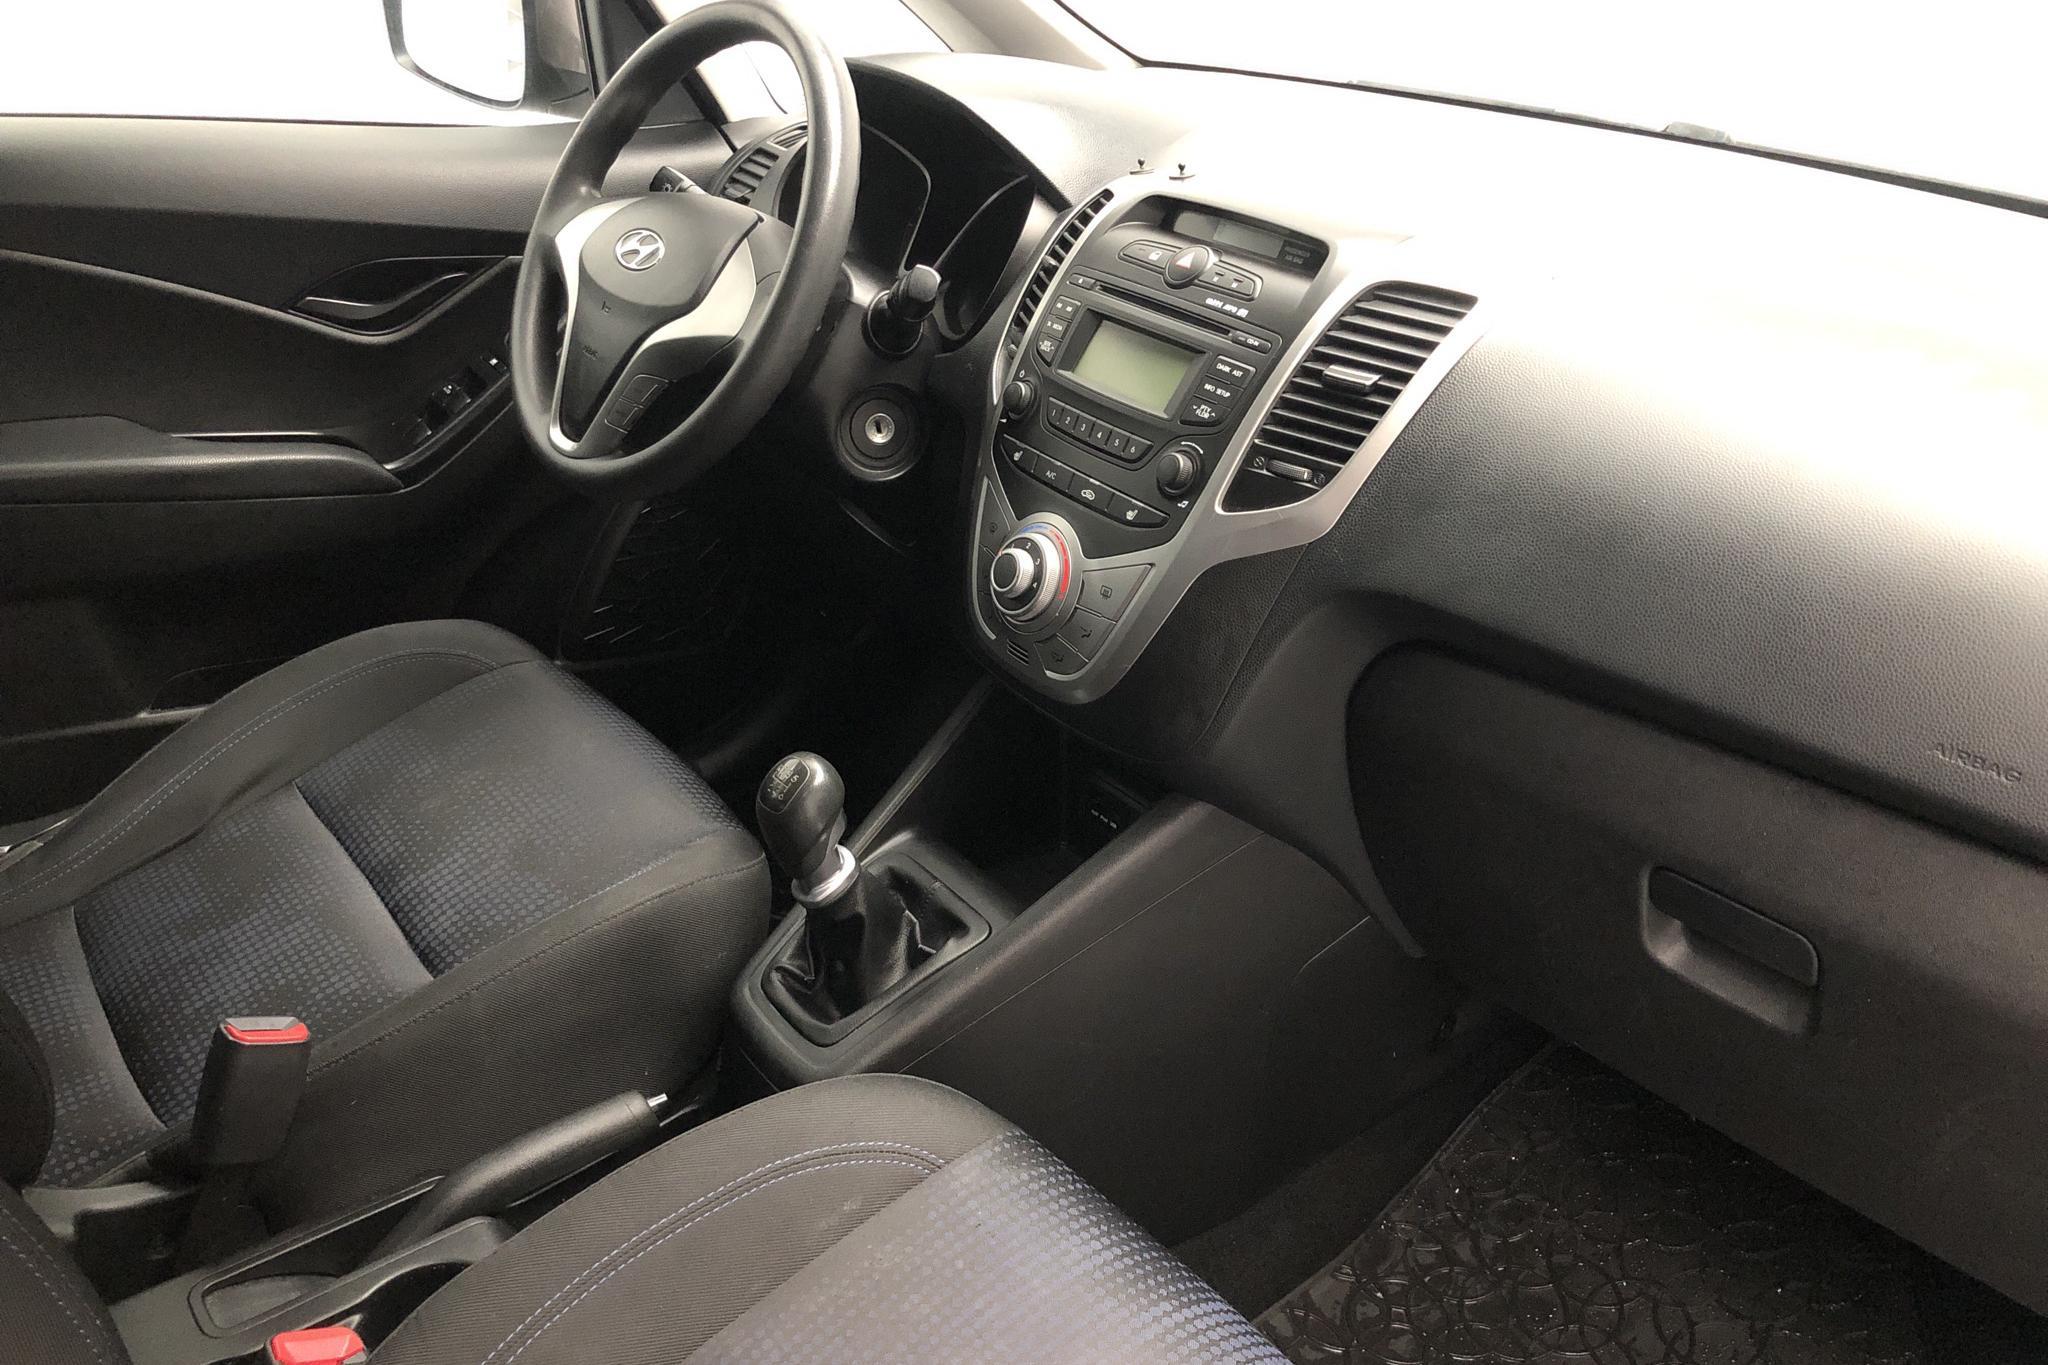 Hyundai ix20 1.4 CRDi (90hk) - 19 834 mil - Manuell - Light Brown - 2012